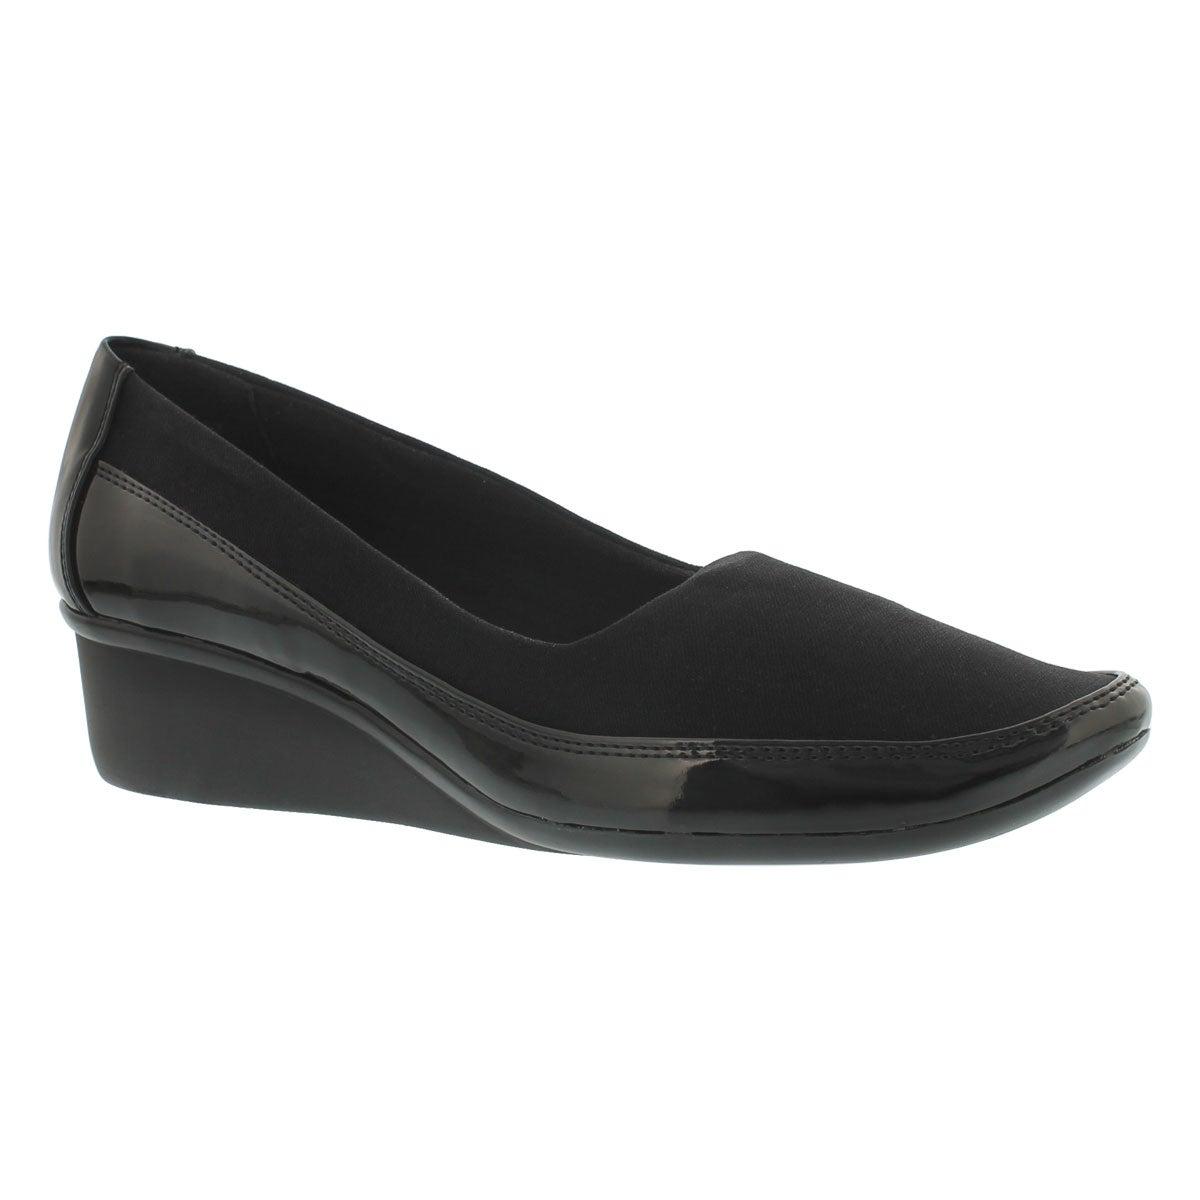 Women's DUSTI black slip on casual wedge shoes